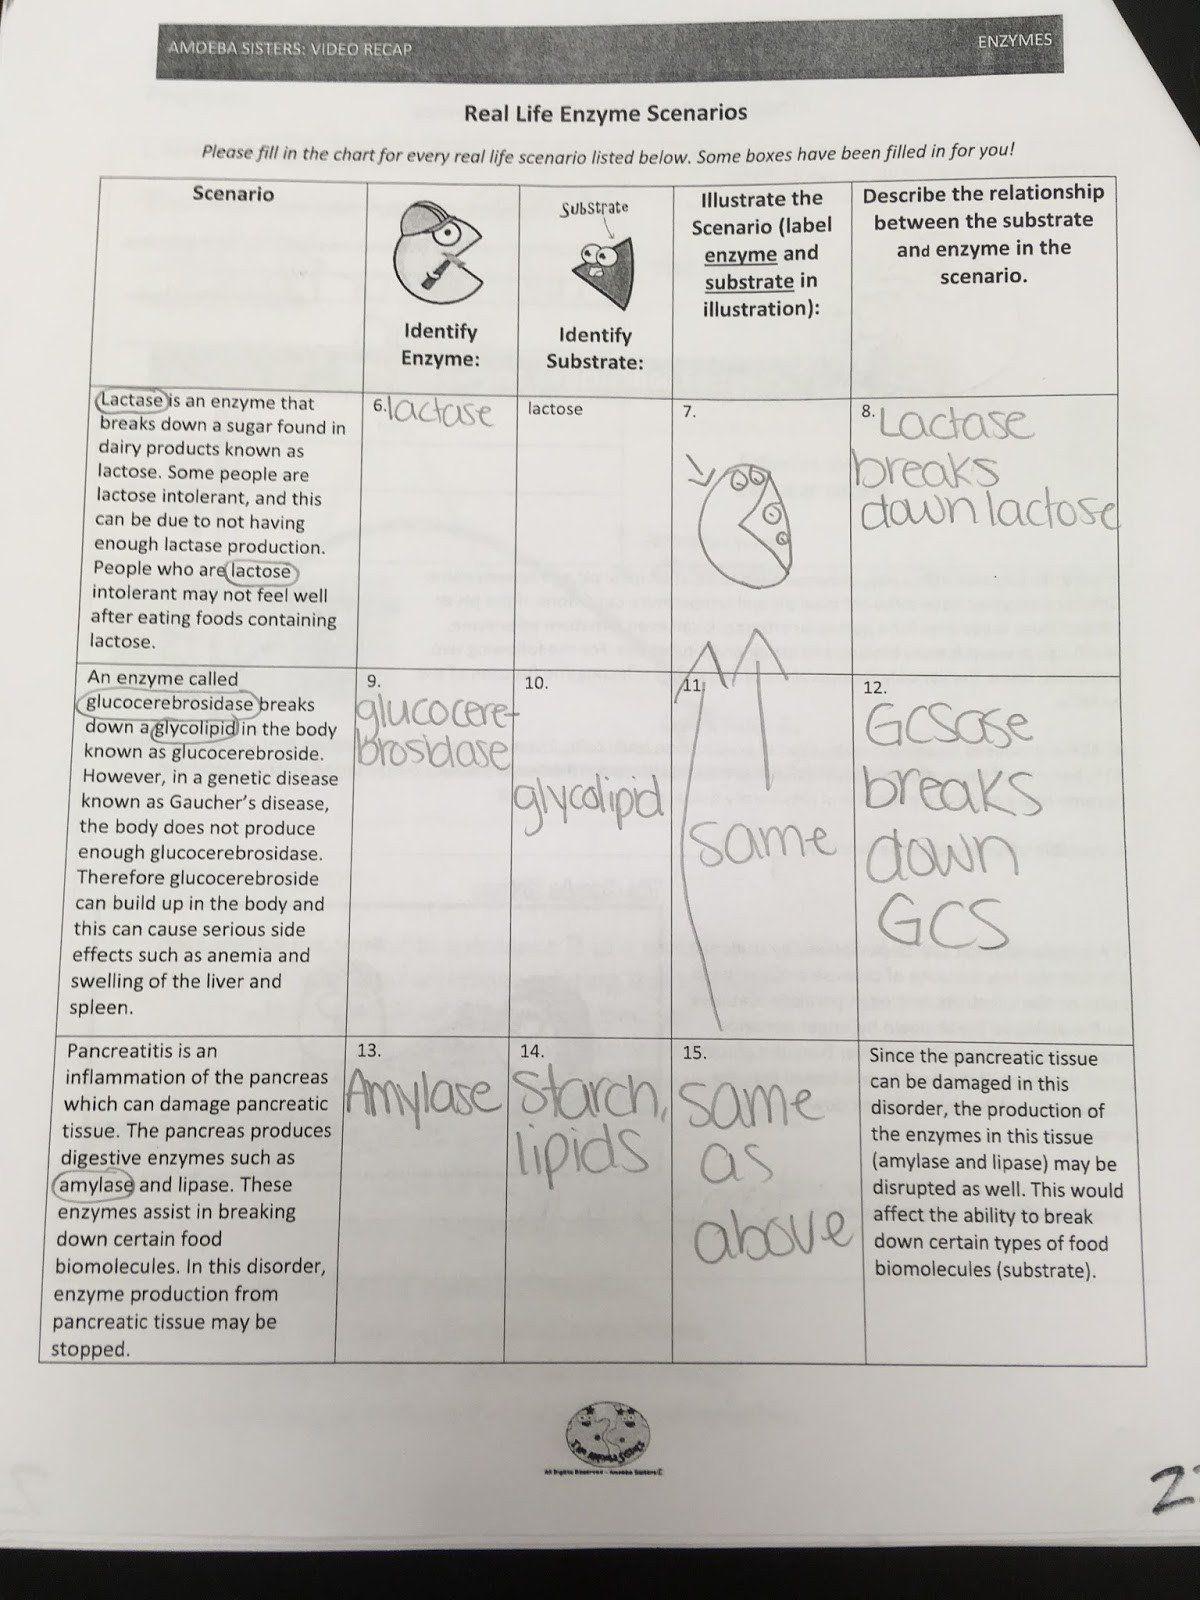 Amoeba Sisters Worksheet Answers Amoeba Sisters Video Recap Answer Key Microscopes Arocrea In 2020 Kindergarten Worksheets Sight Words Worksheets Sight Word Worksheets